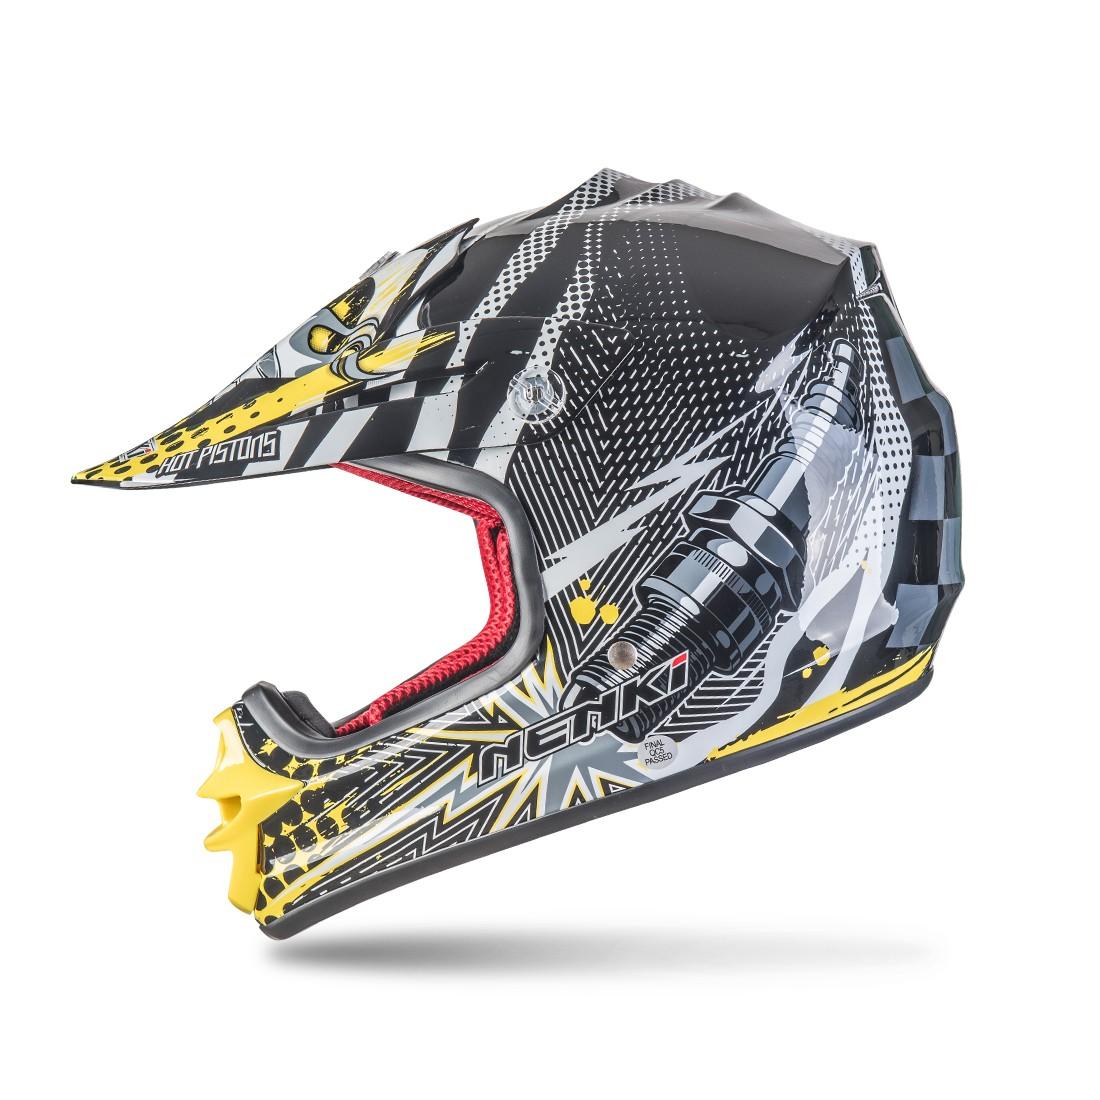 Nenki cool motocross helmets suppliers for motorcycle-6